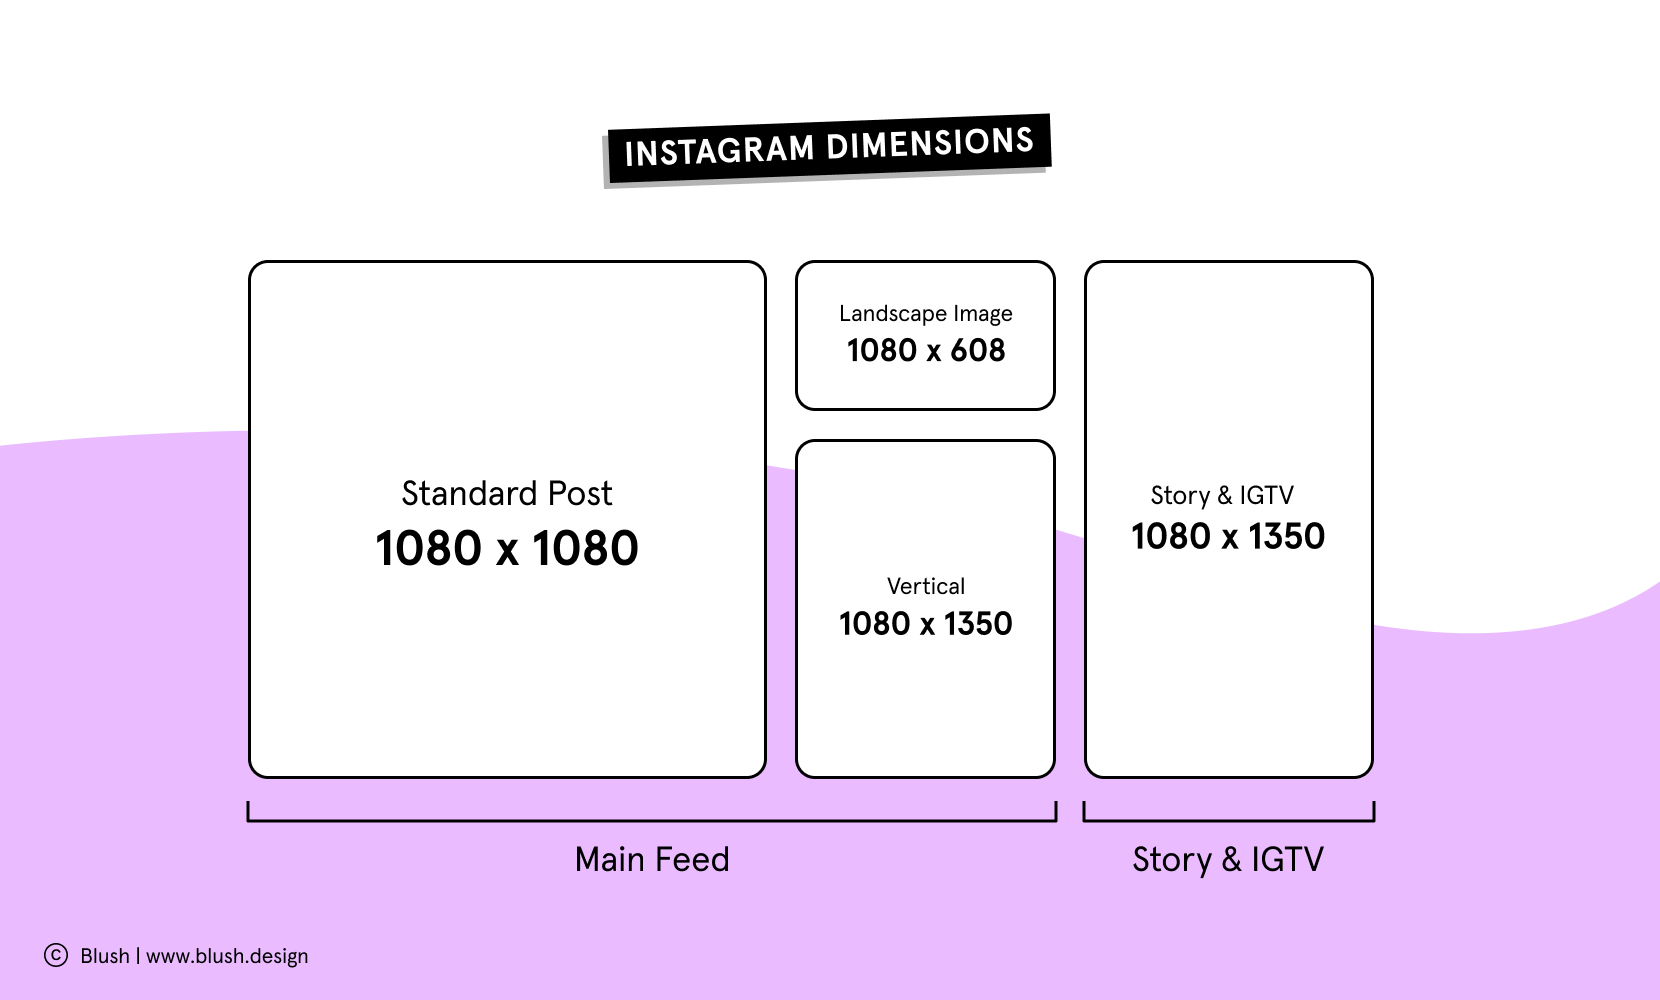 Instagram dimensions standard post 1080 x 1080, Landscape image 1080 x 608,